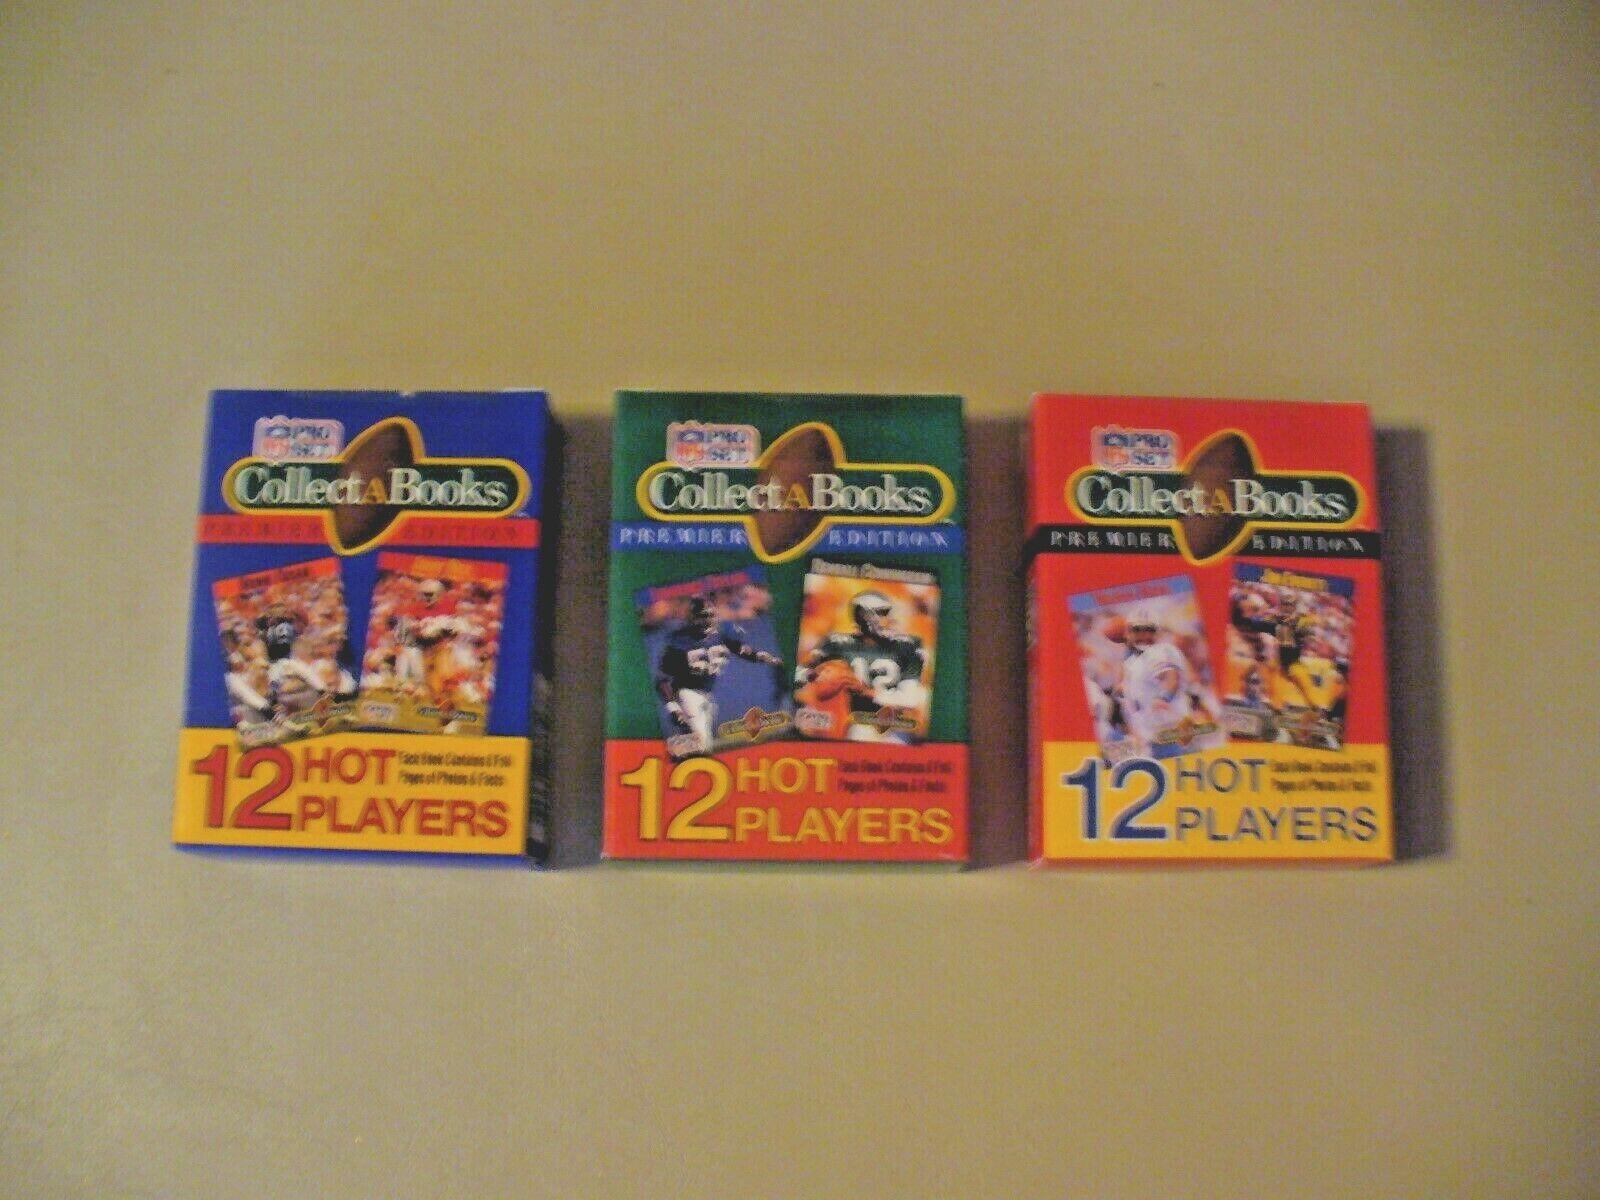 Pro Set - CollectaBooks - Premier Edition - 1990 - NFL - Series I,II,III - VIN. - $4.50